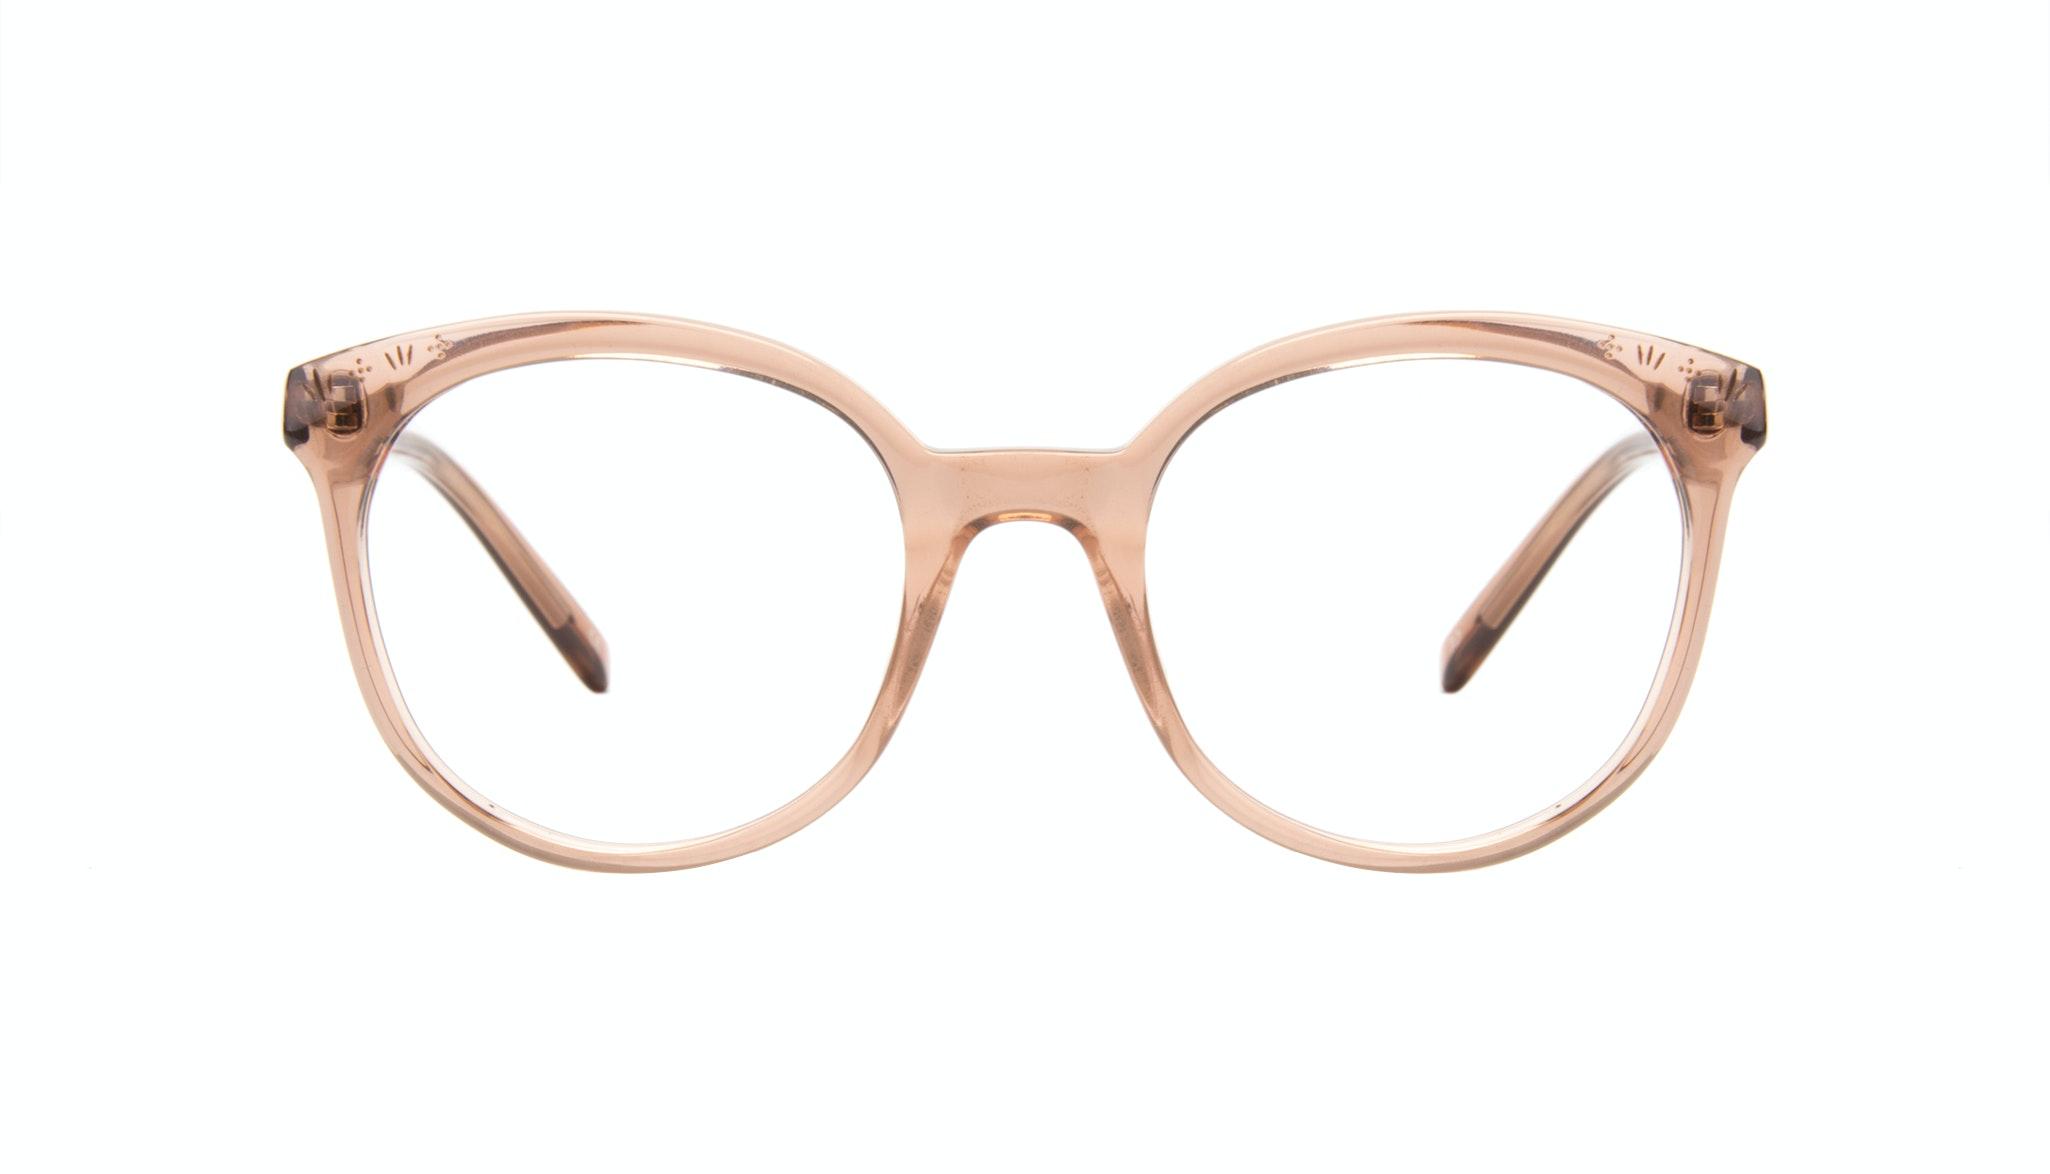 Affordable Fashion Glasses Round Eyeglasses Women Must Rose